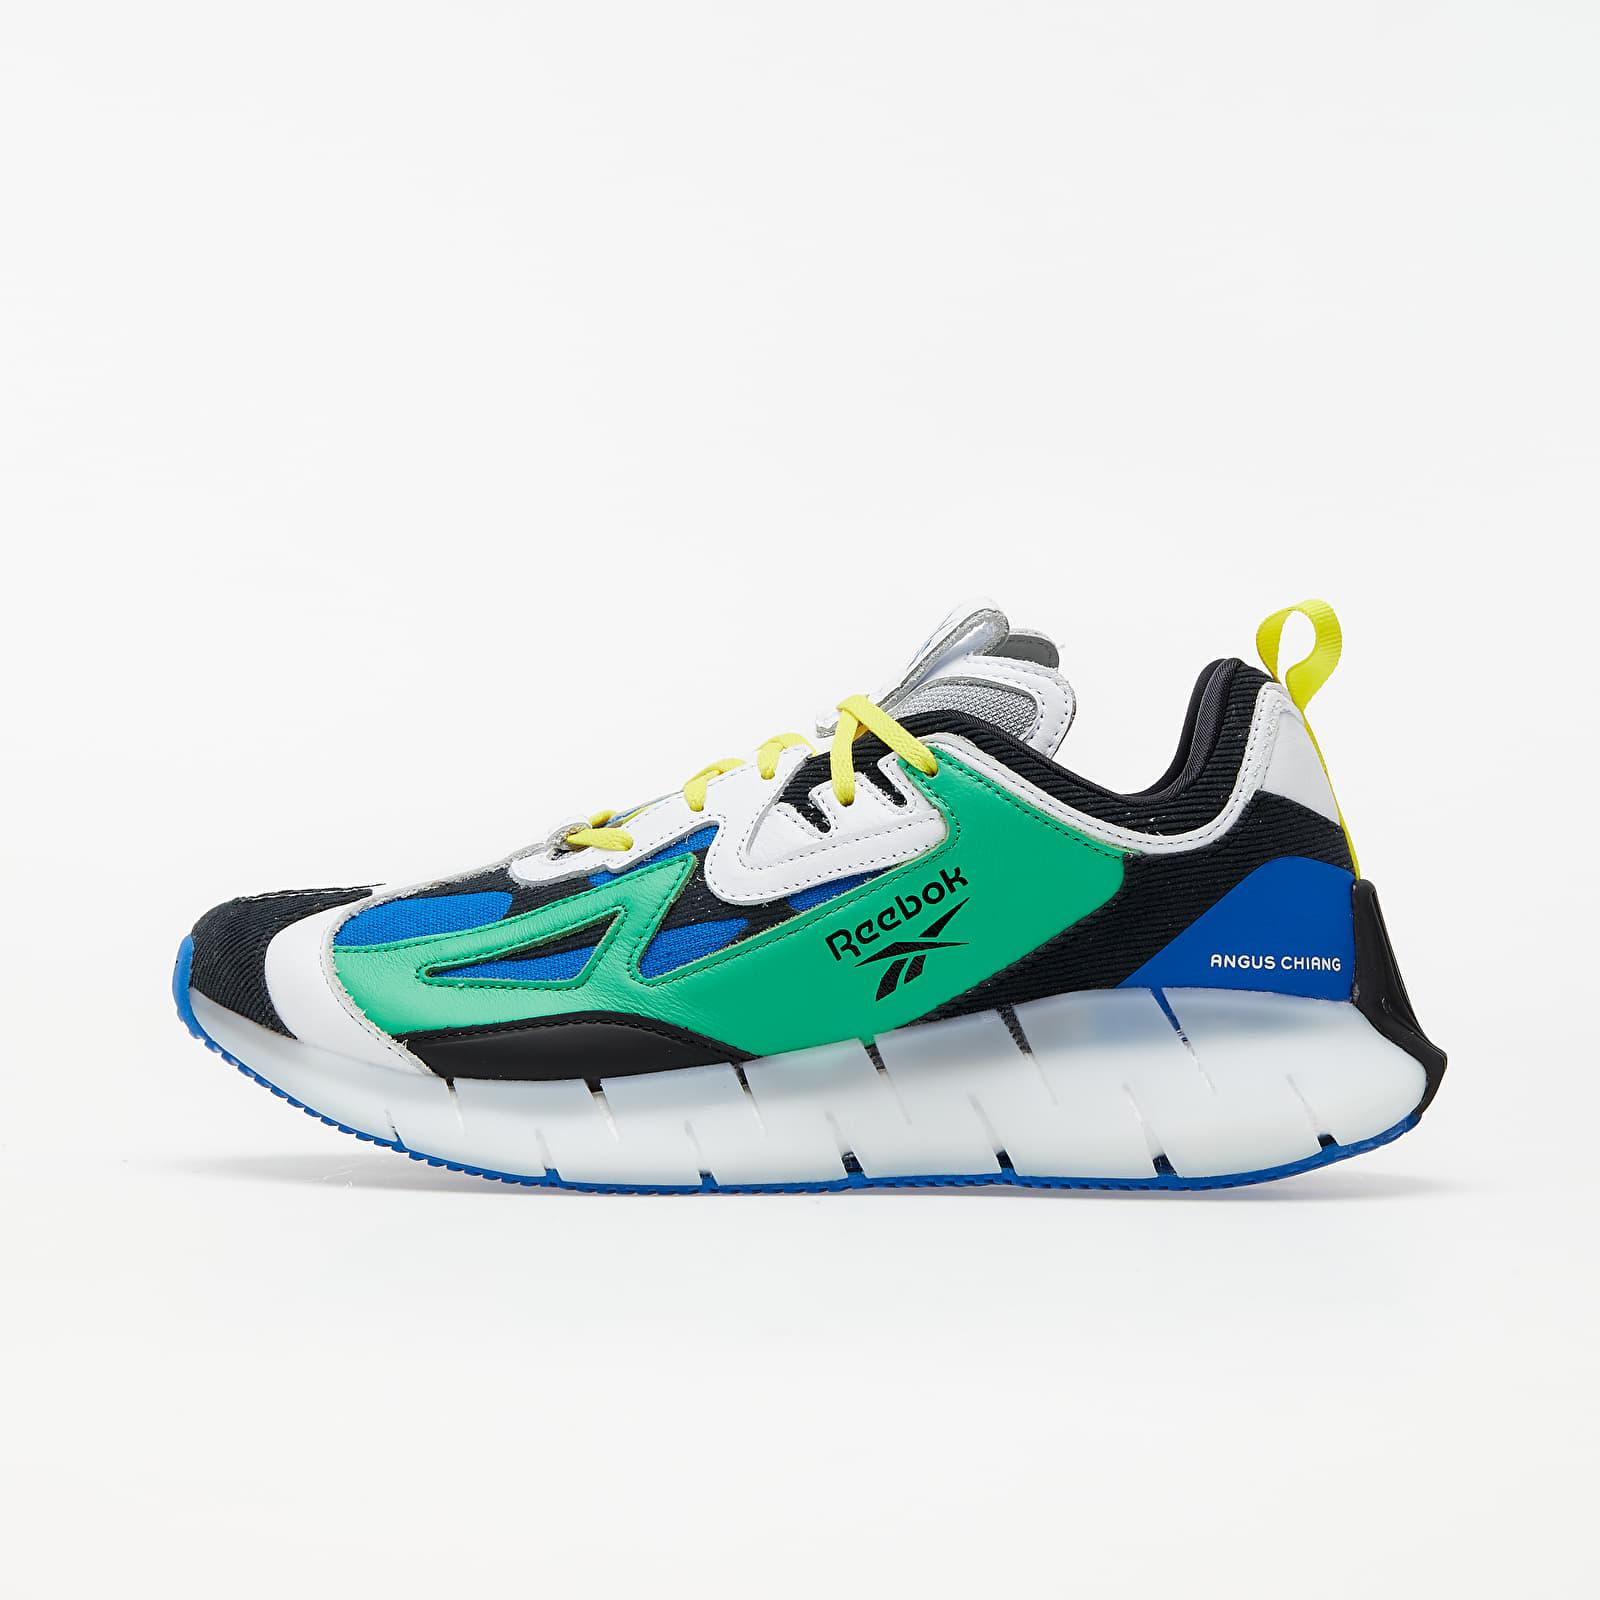 Men's shoes Reebok Zig Kinetica Concept Bot Green/ White/ Bright Yellow